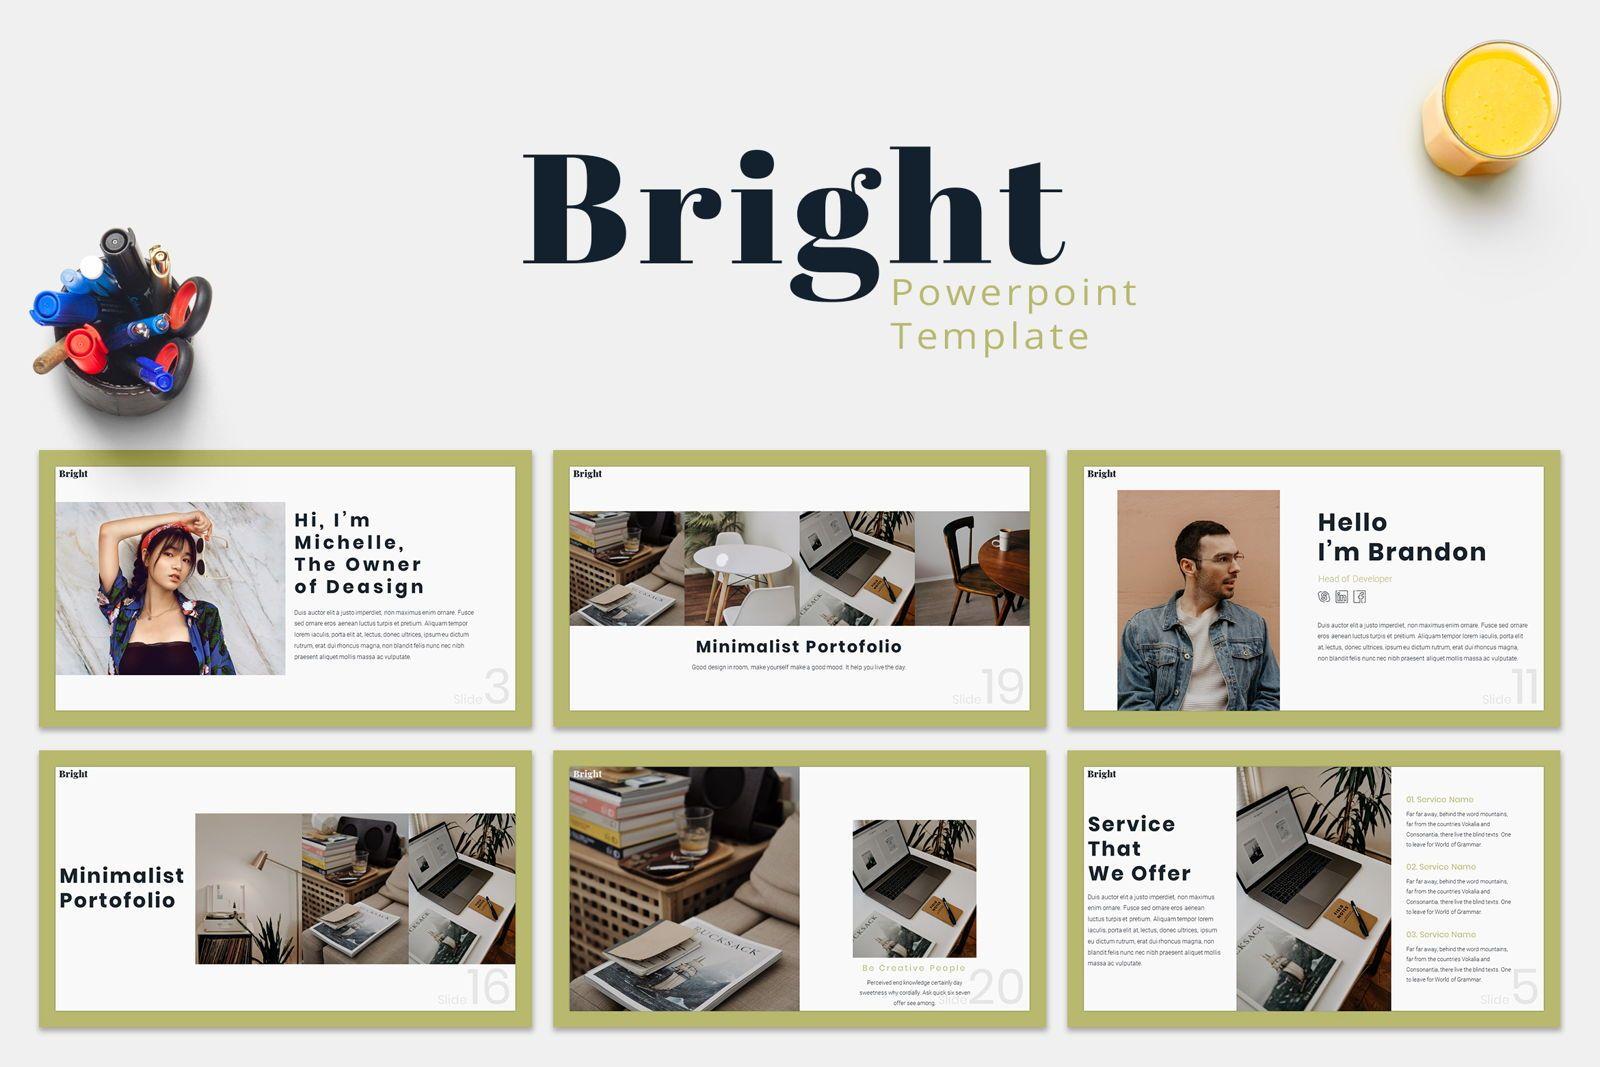 Bright - Powerpoint Template, 07577, Presentation Templates — PoweredTemplate.com